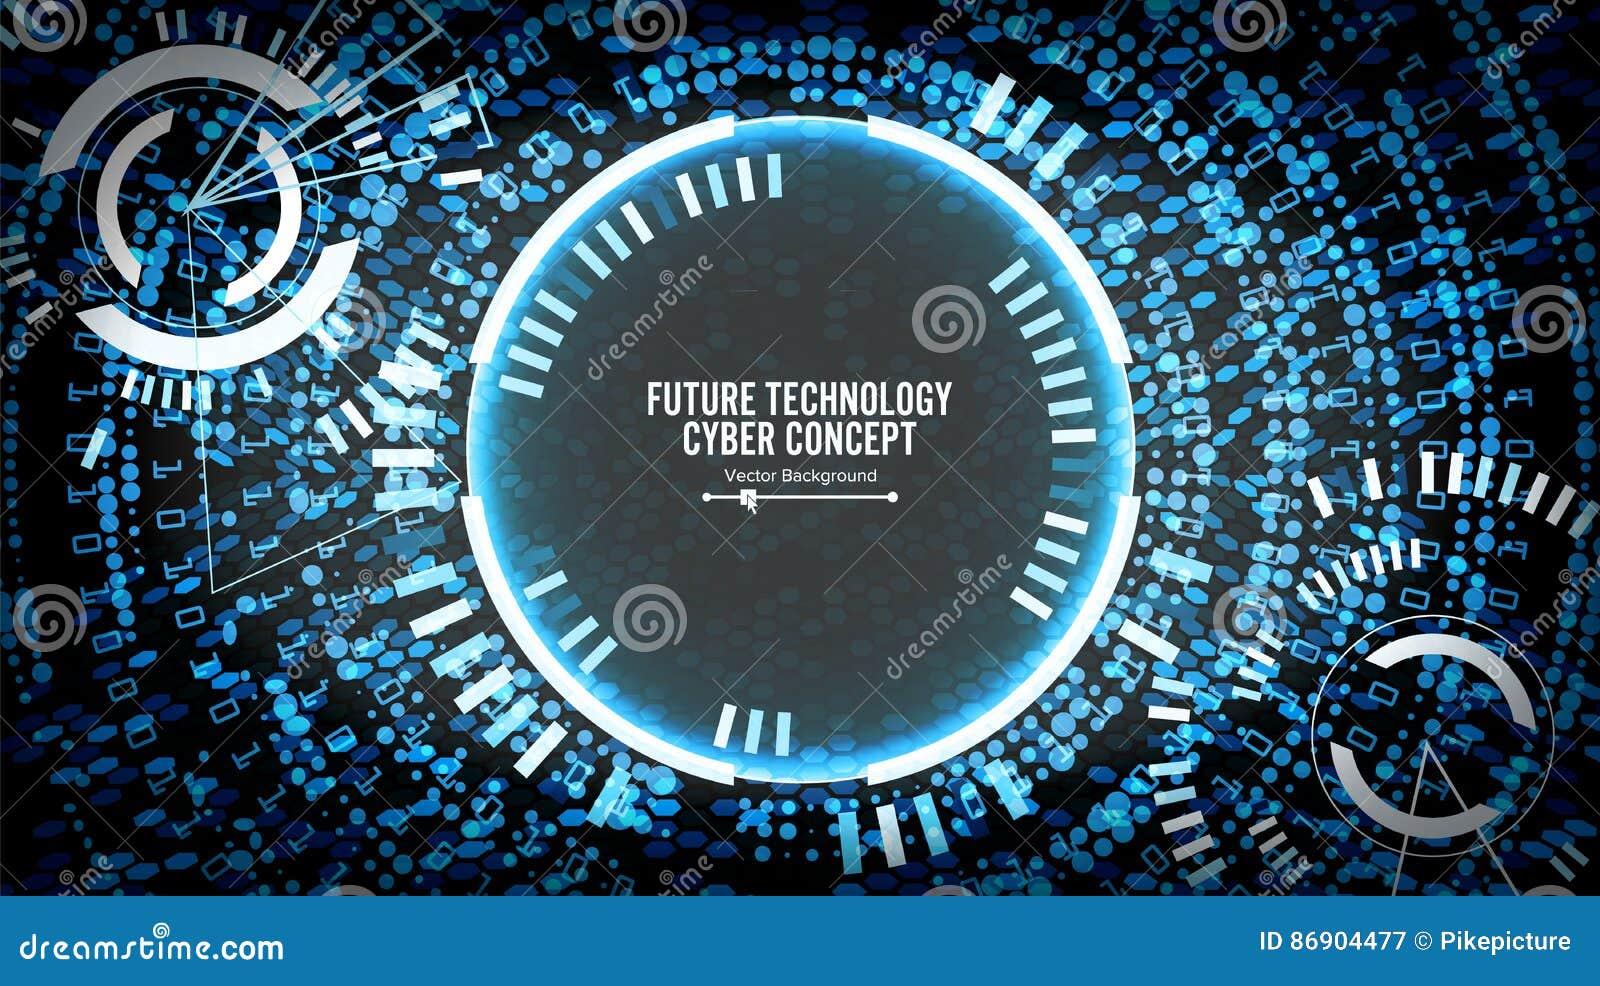 cyberspace technology